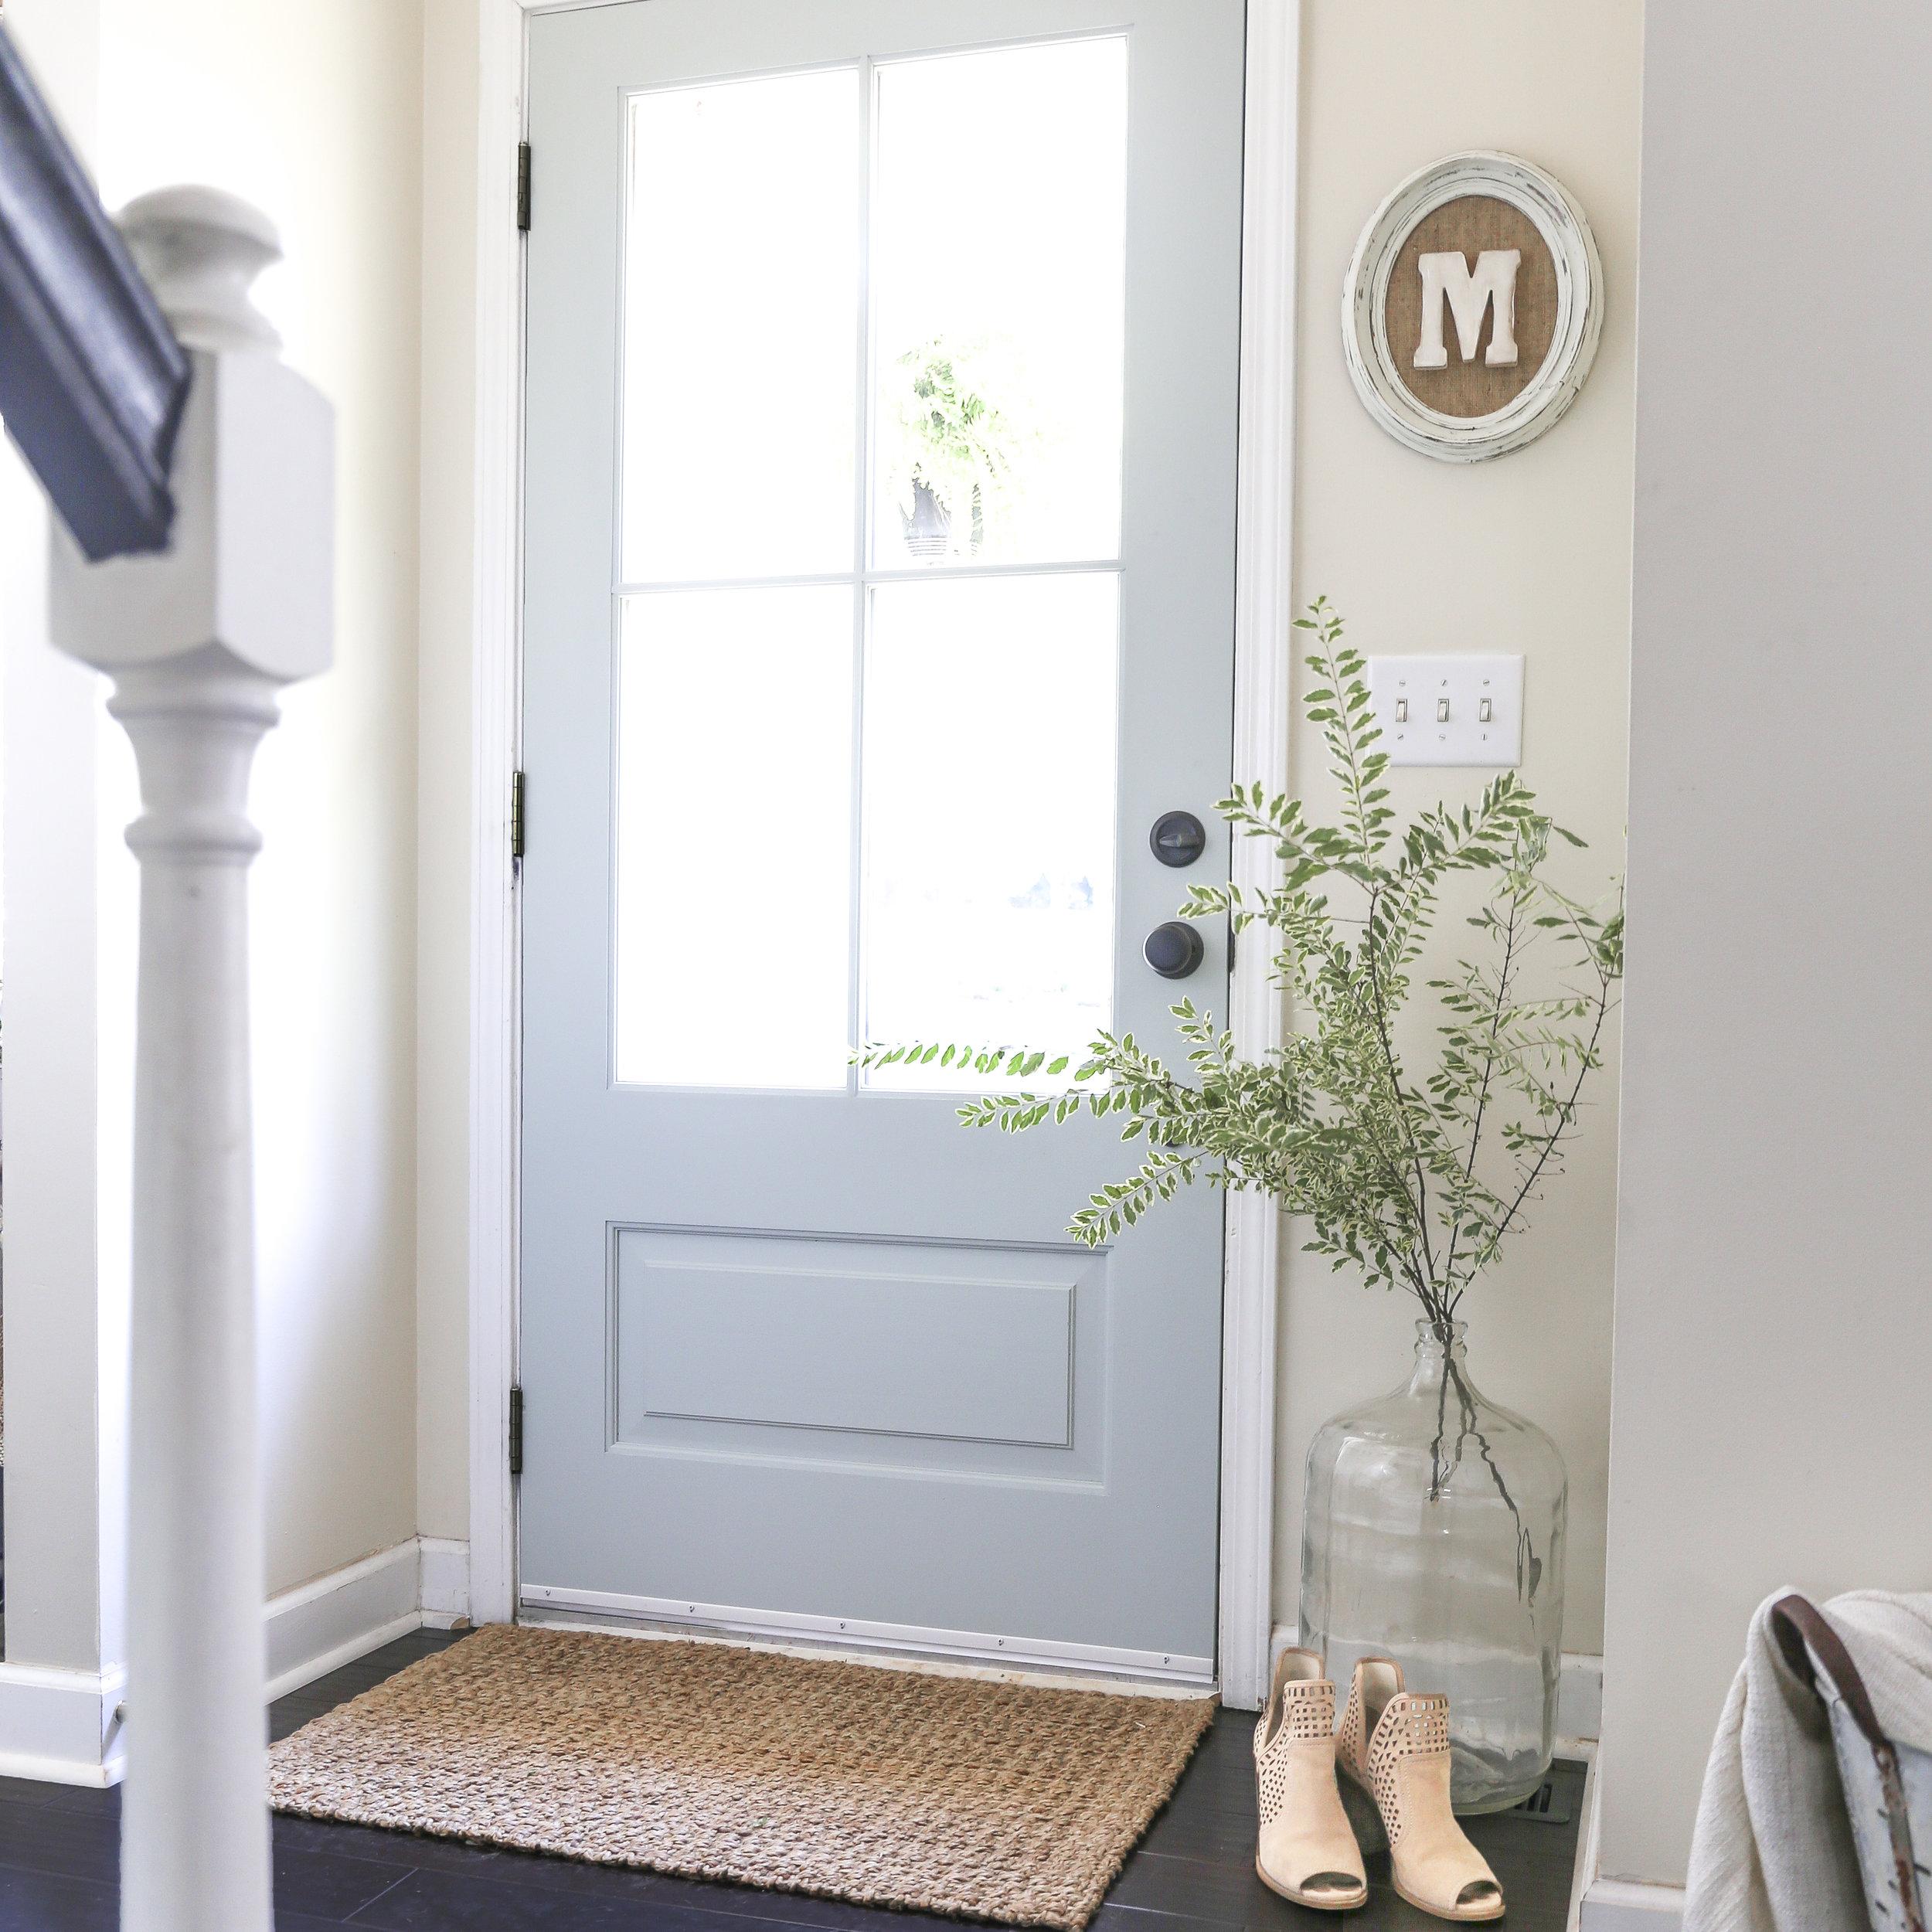 How to install an exterior front door with Simpson Door Company- Light blue modern farmhouse style door.